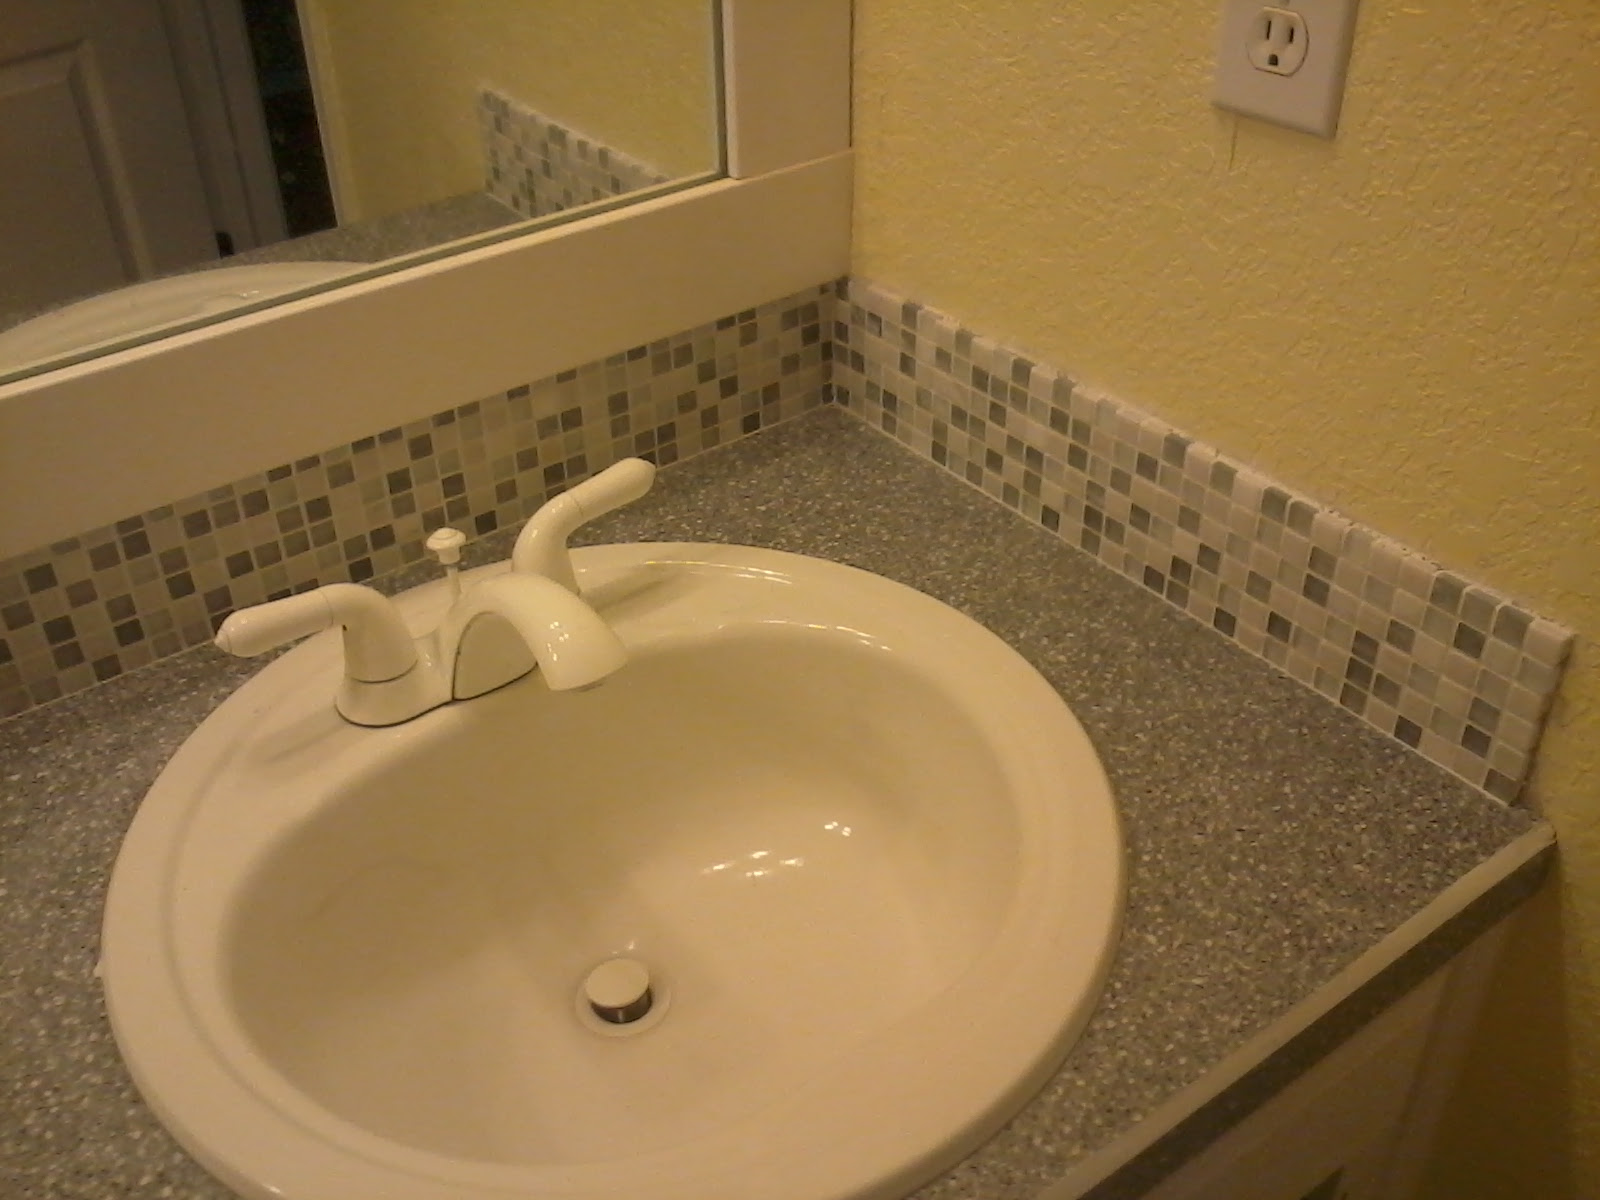 mosaic tile for bathroom backsplash | Simply Rooms (by design)